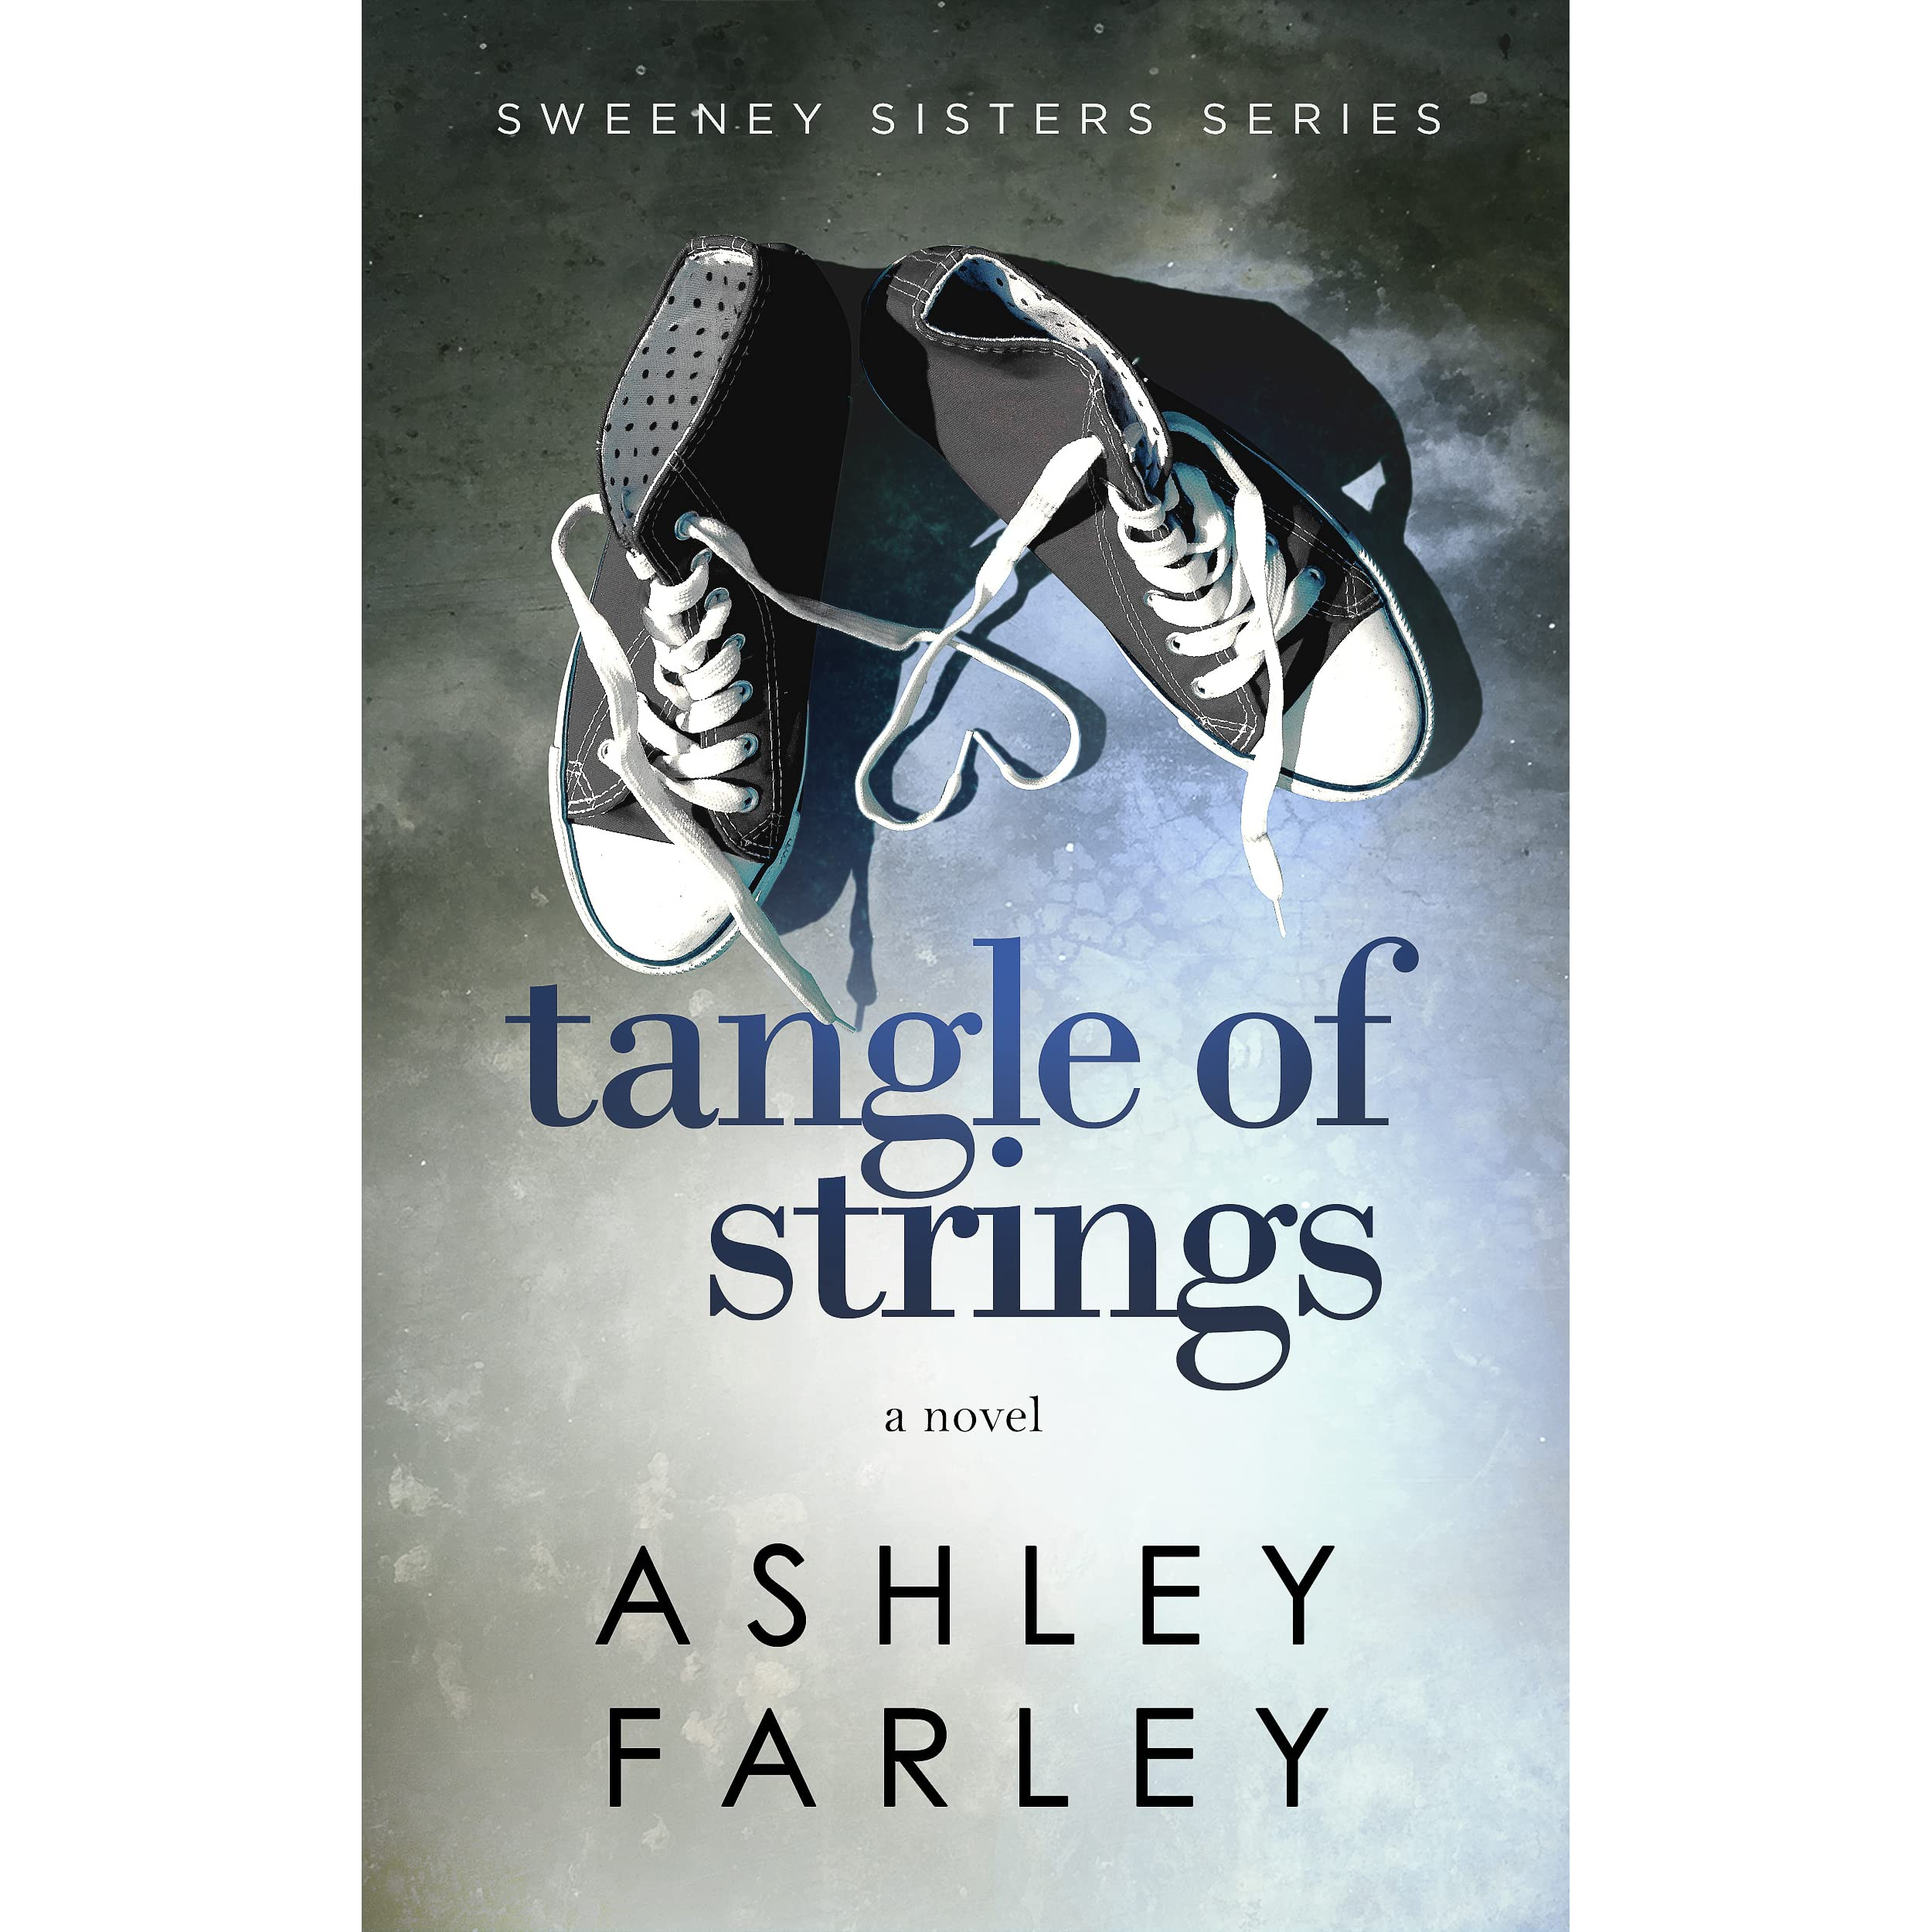 The Sweeney Sisters A Novel